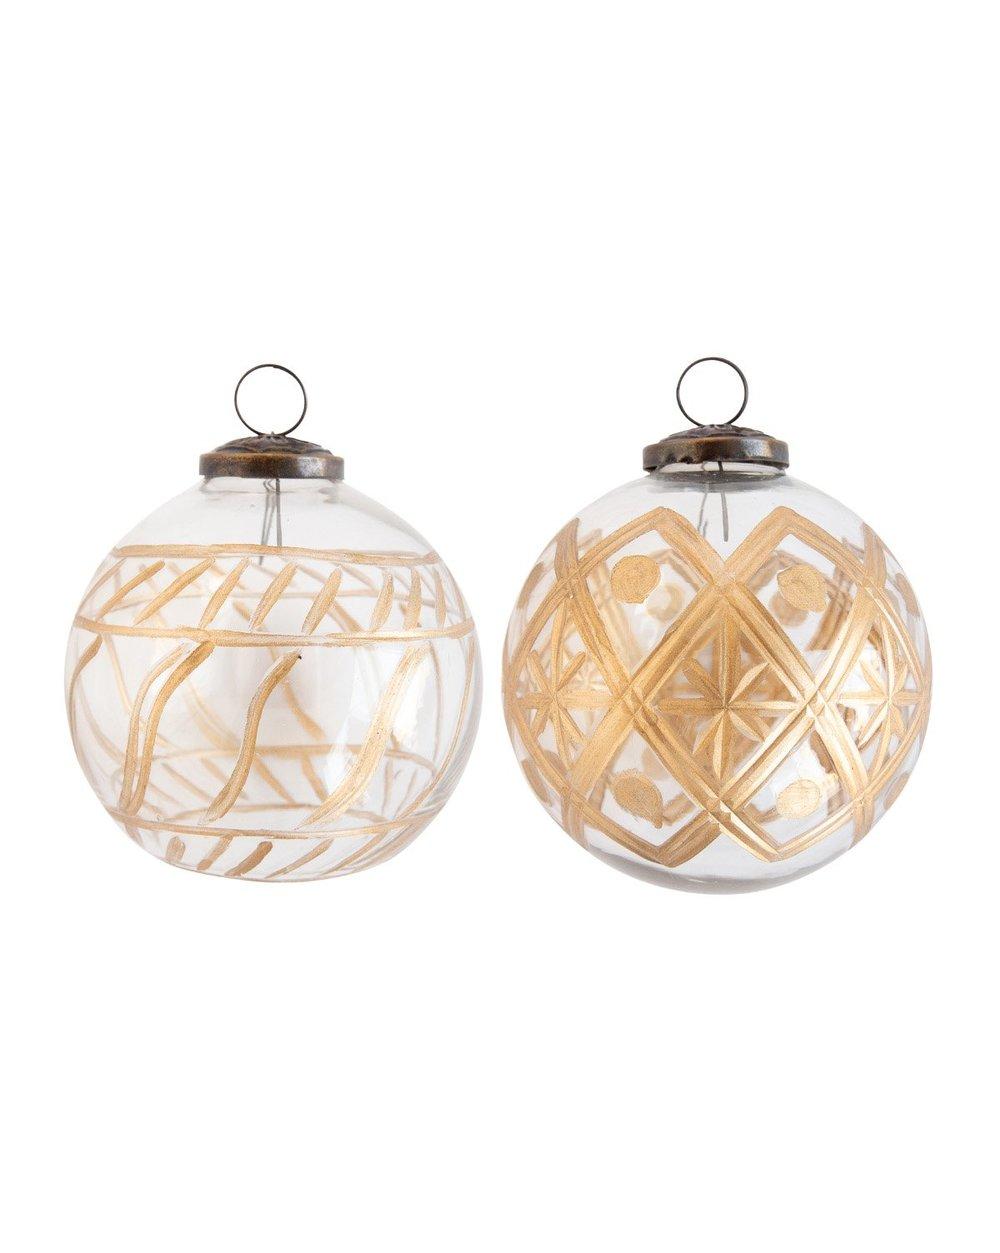 Etched_Mercury_Ball_Ornaments_2.jpg